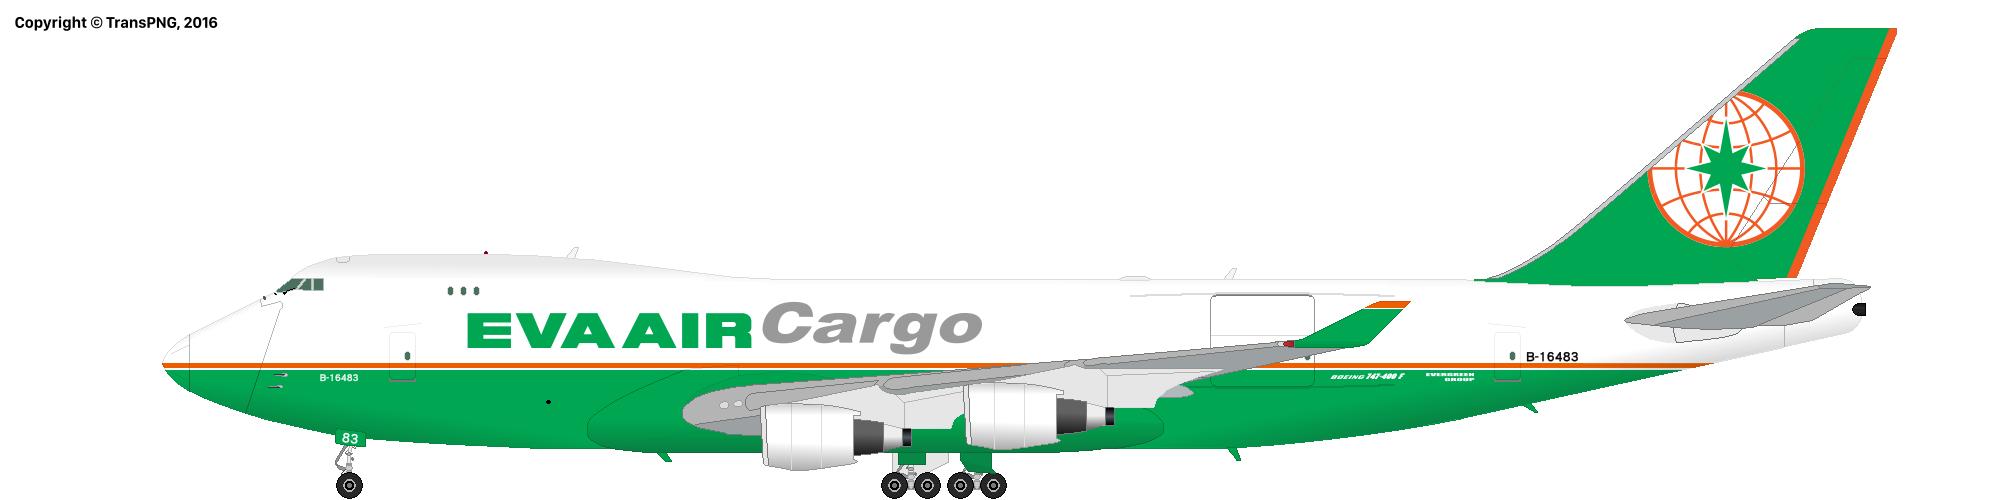 Airplane 6204